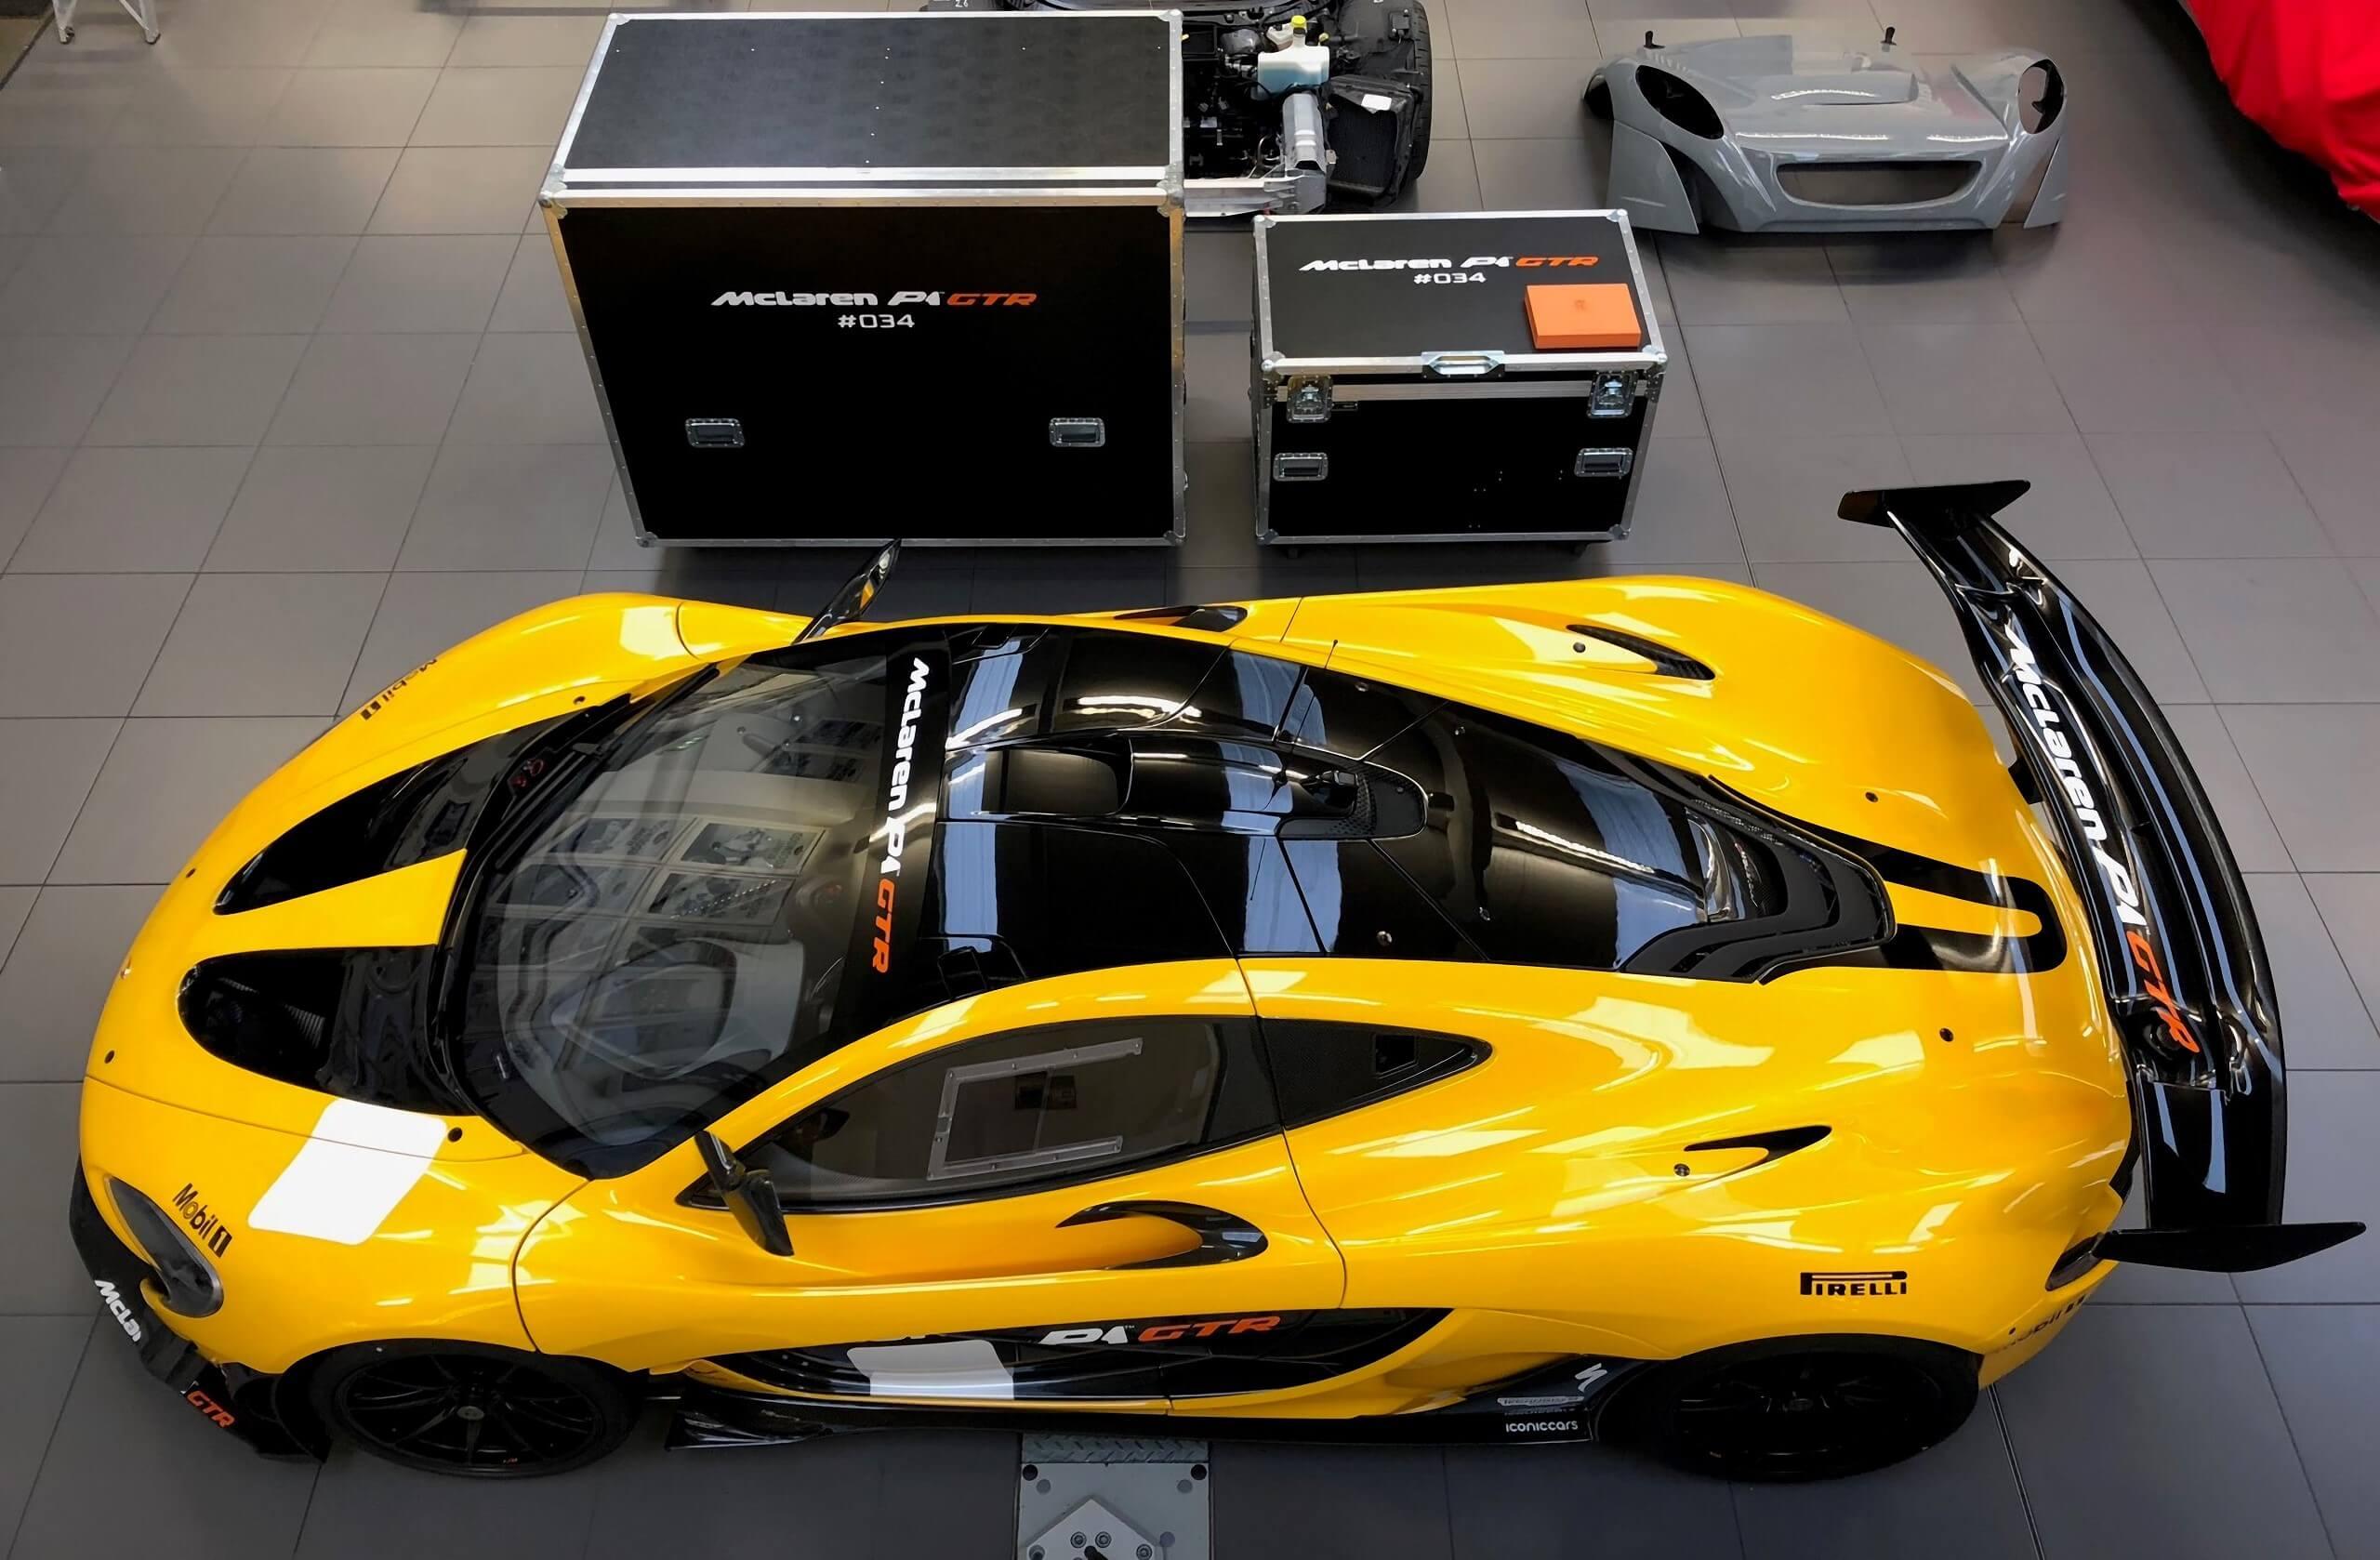 Street-legal-McLaren-P1-GTR-for-sale-38